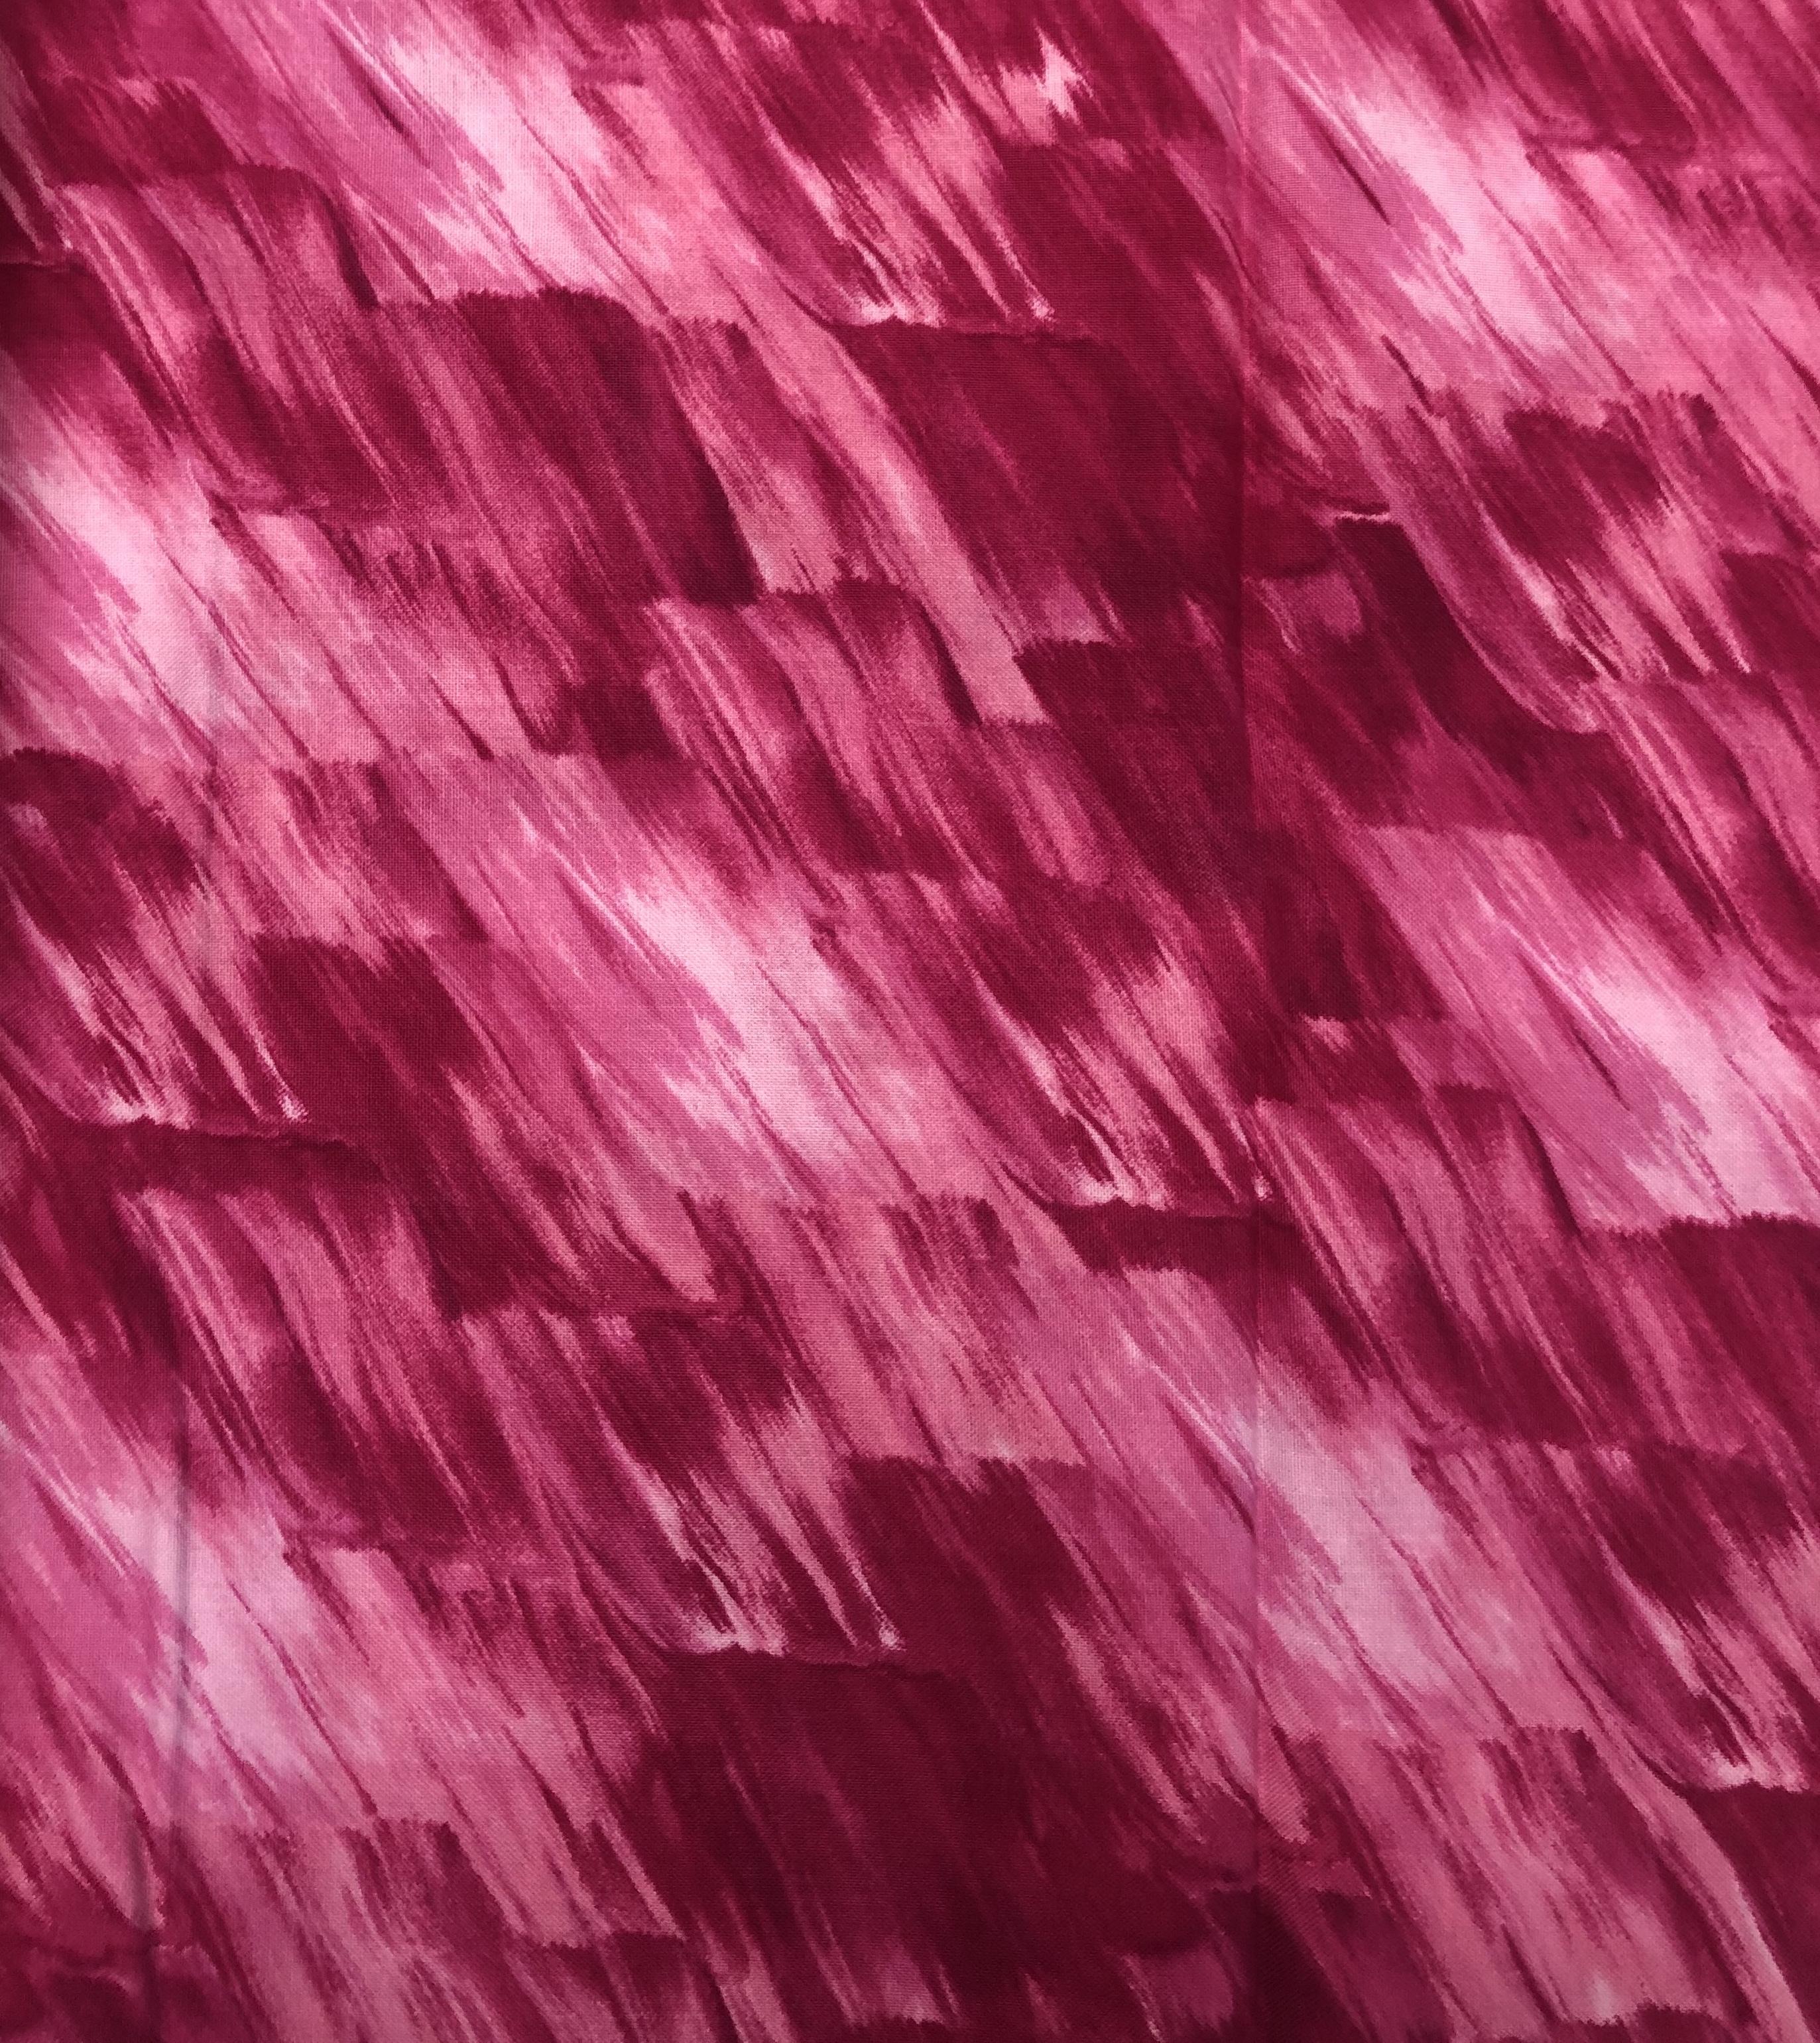 Patio Splash - Kanvas - 1/2m cut 55458